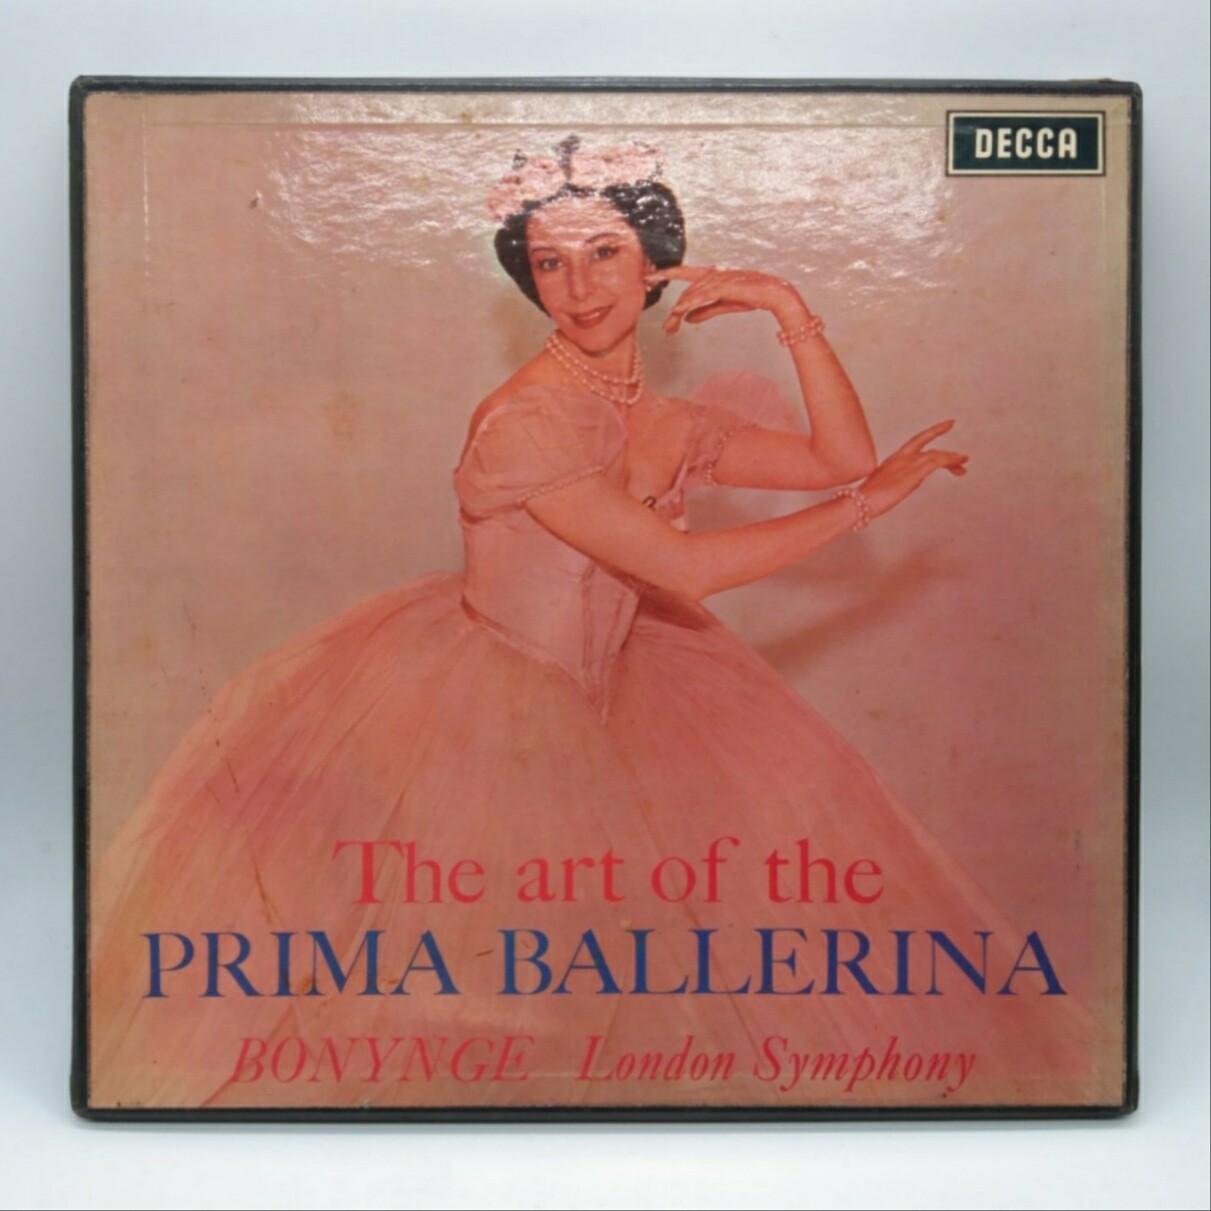 [USED] RICHARD BONYNGE•LONDON SYMPHONY ORCHESTRA -THE ART OF PRIMA BALLERINA- 2XLP